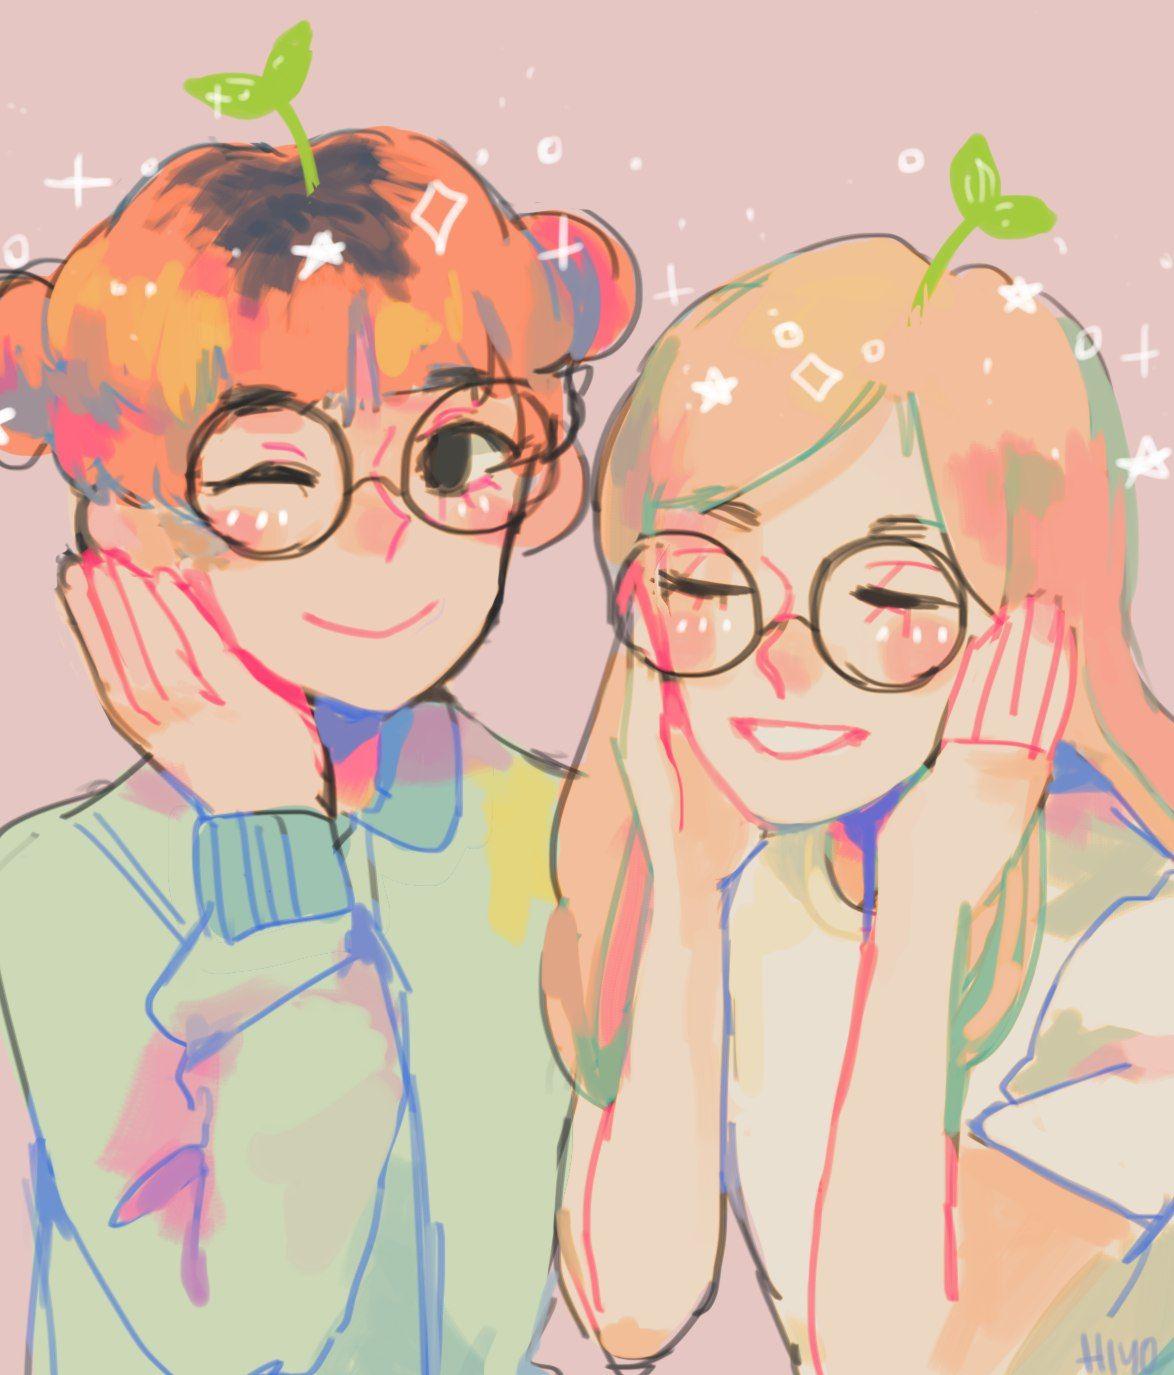 Pin by Alluka on Character Art, Cute art, Cute art styles